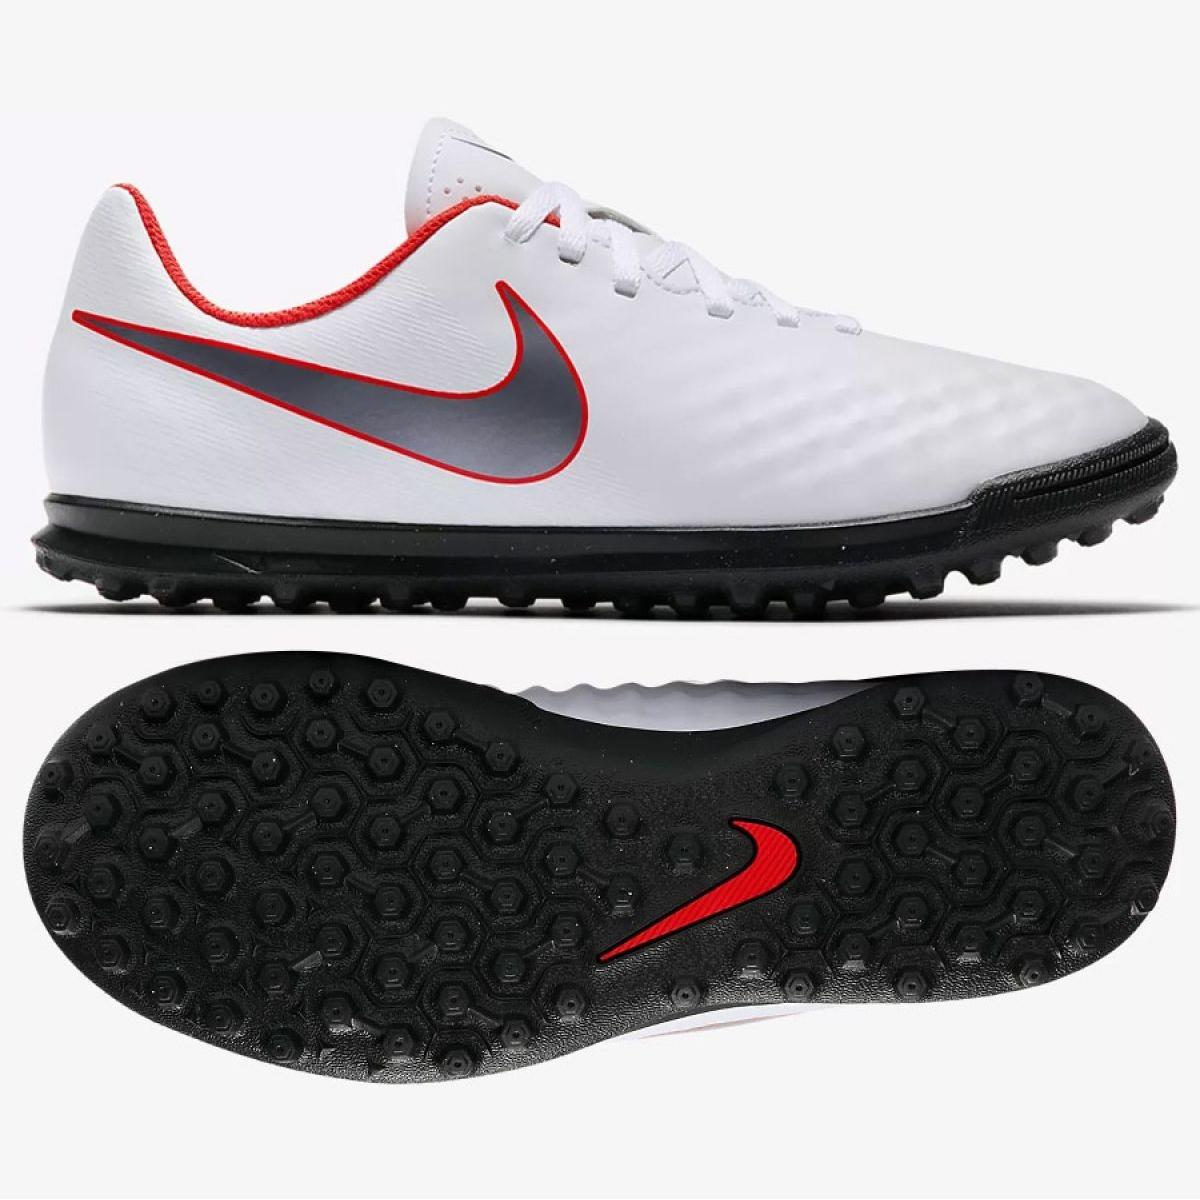 Labdarúgás cipő Nike Magista ObraX 2 Club Tf Jr AH7317 107 fehér fehér